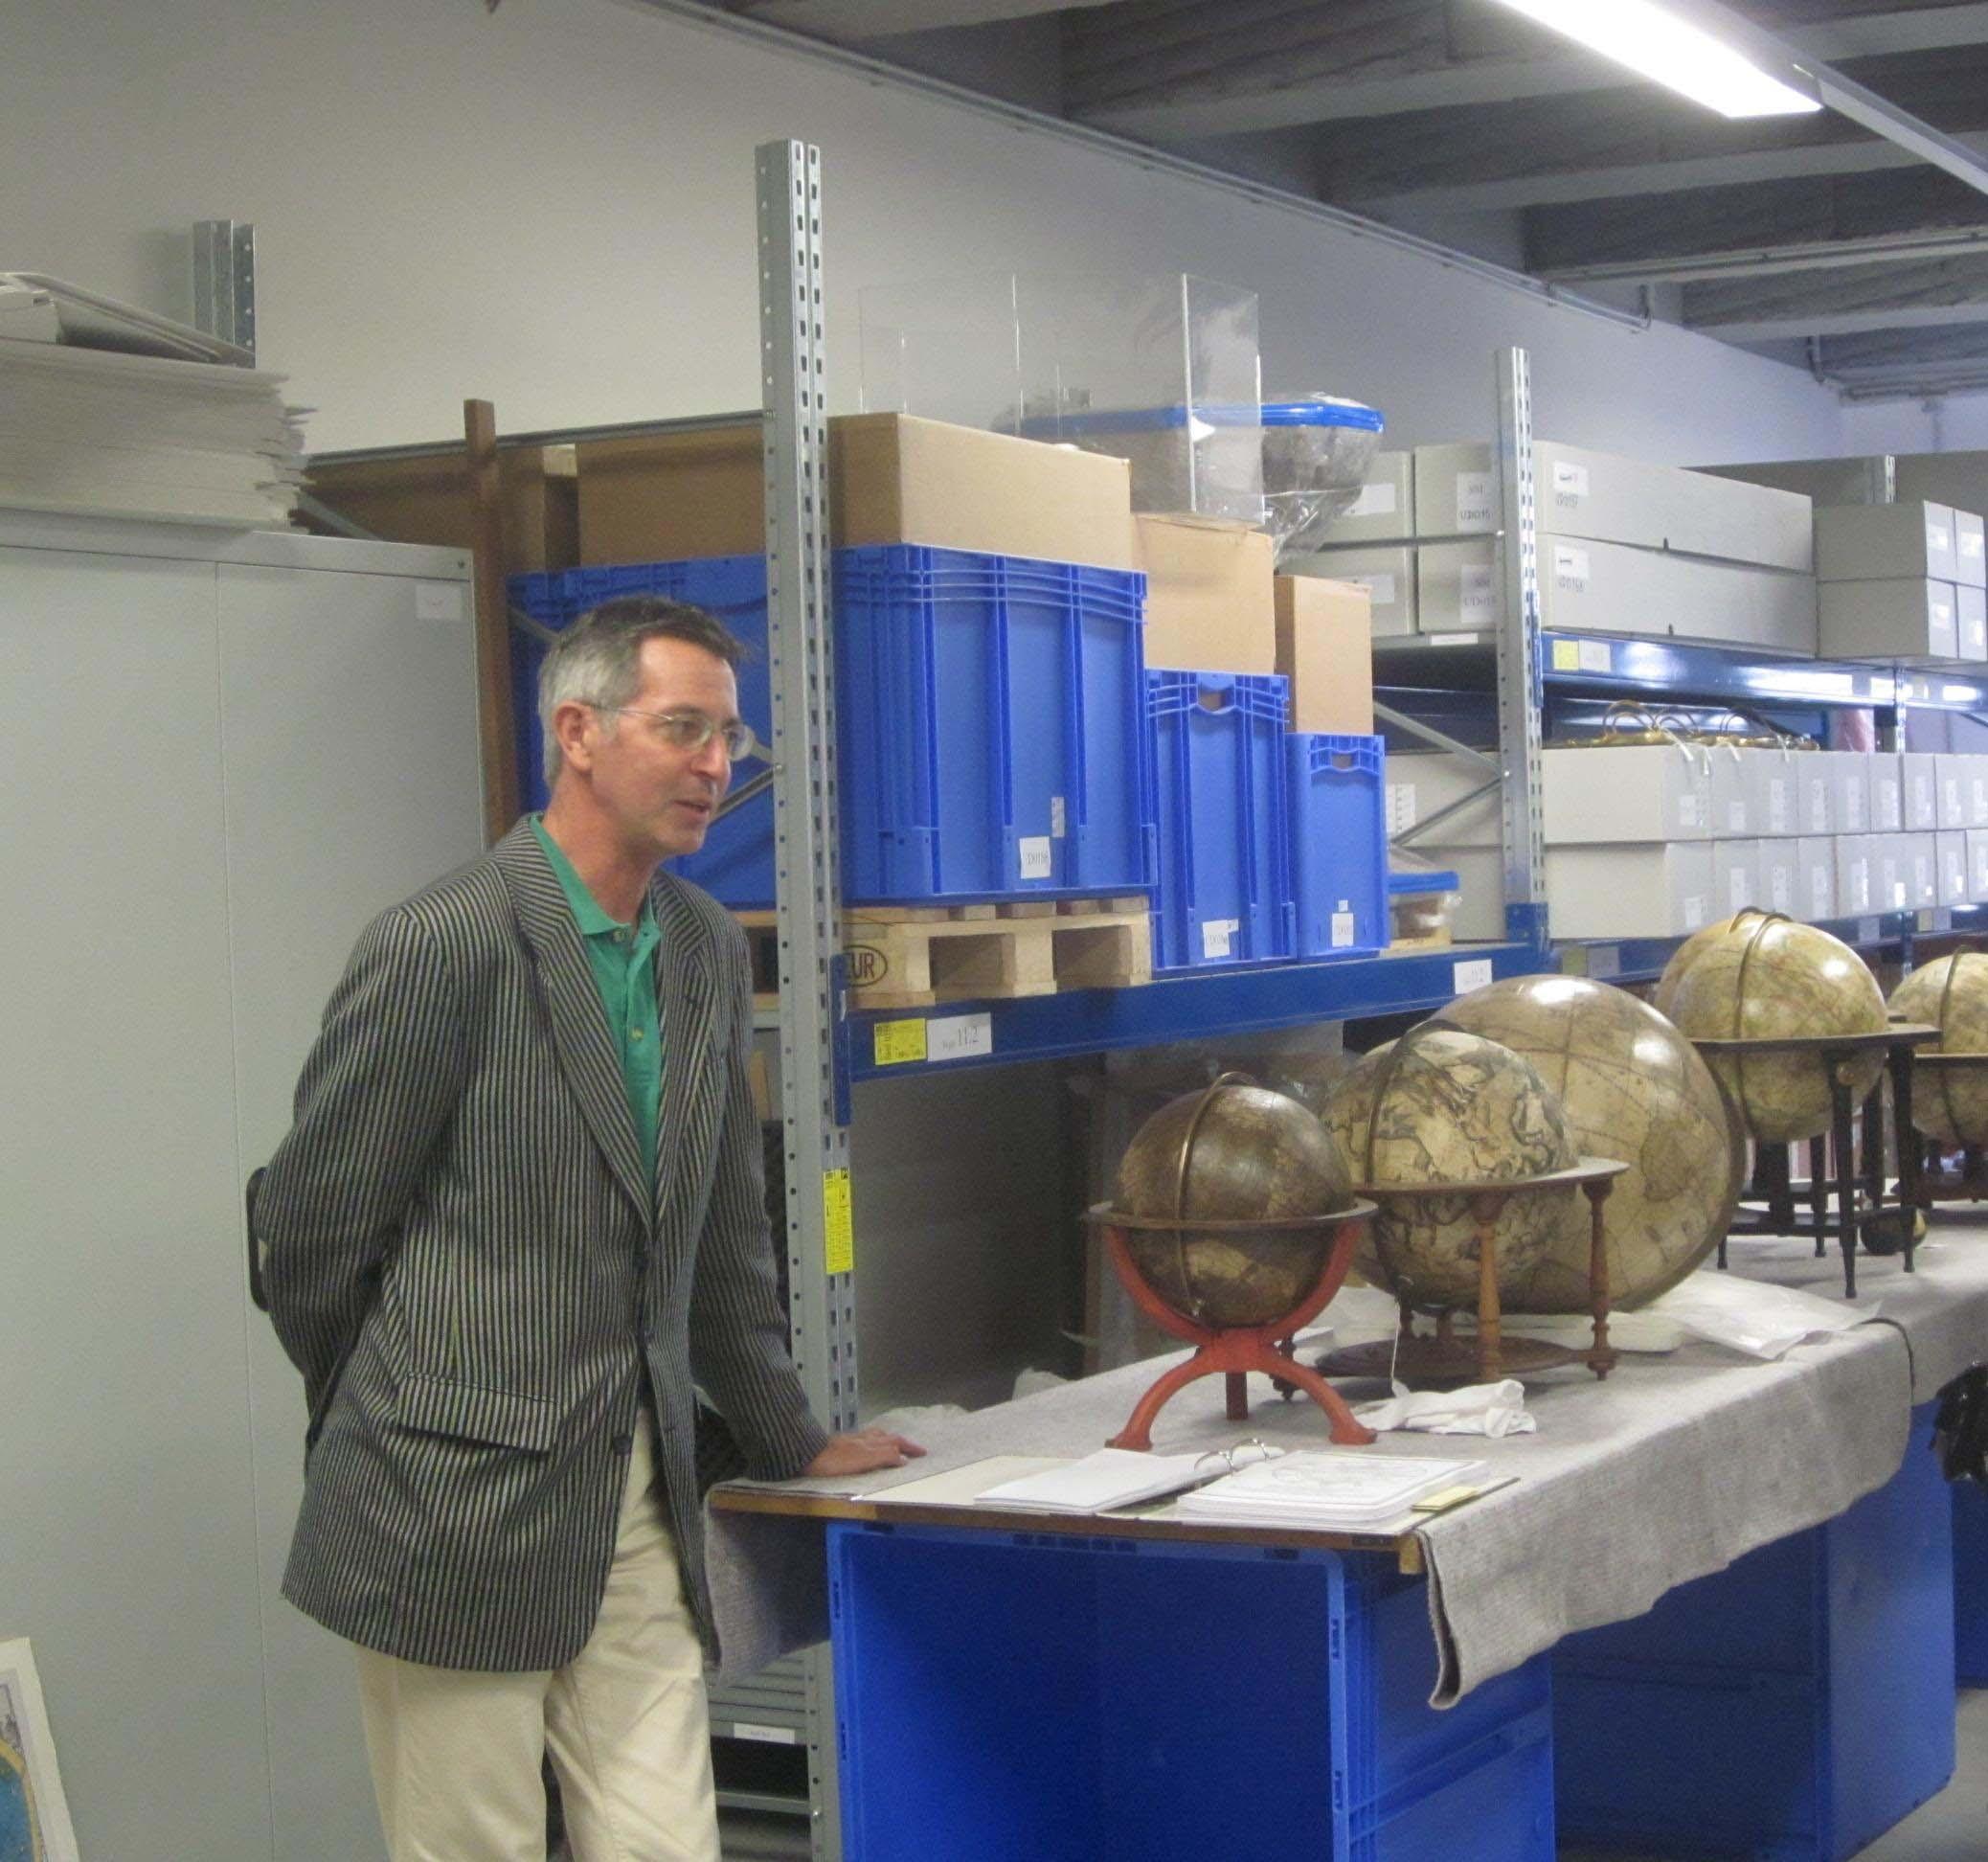 historisches museum frankfurt: schöner globus